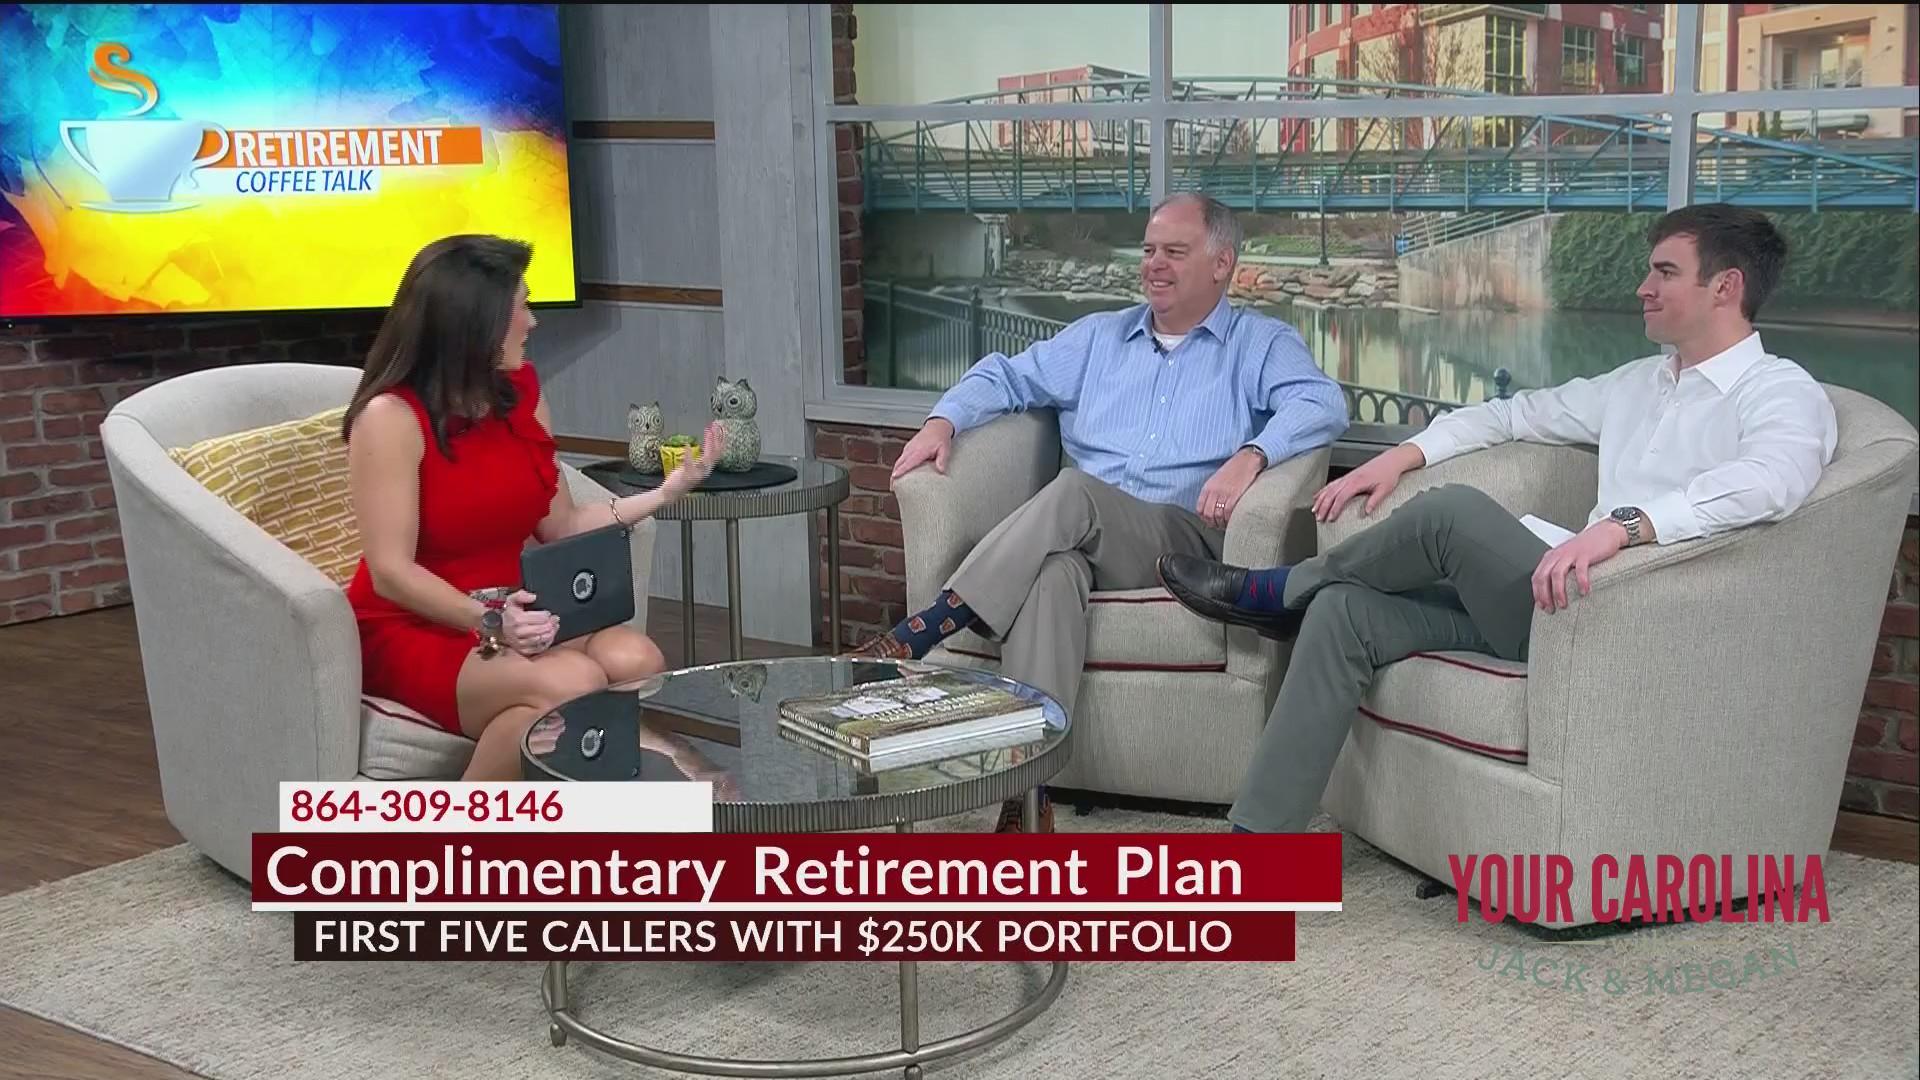 Retirement Coffee Talk - Can Your Portfolio Survive